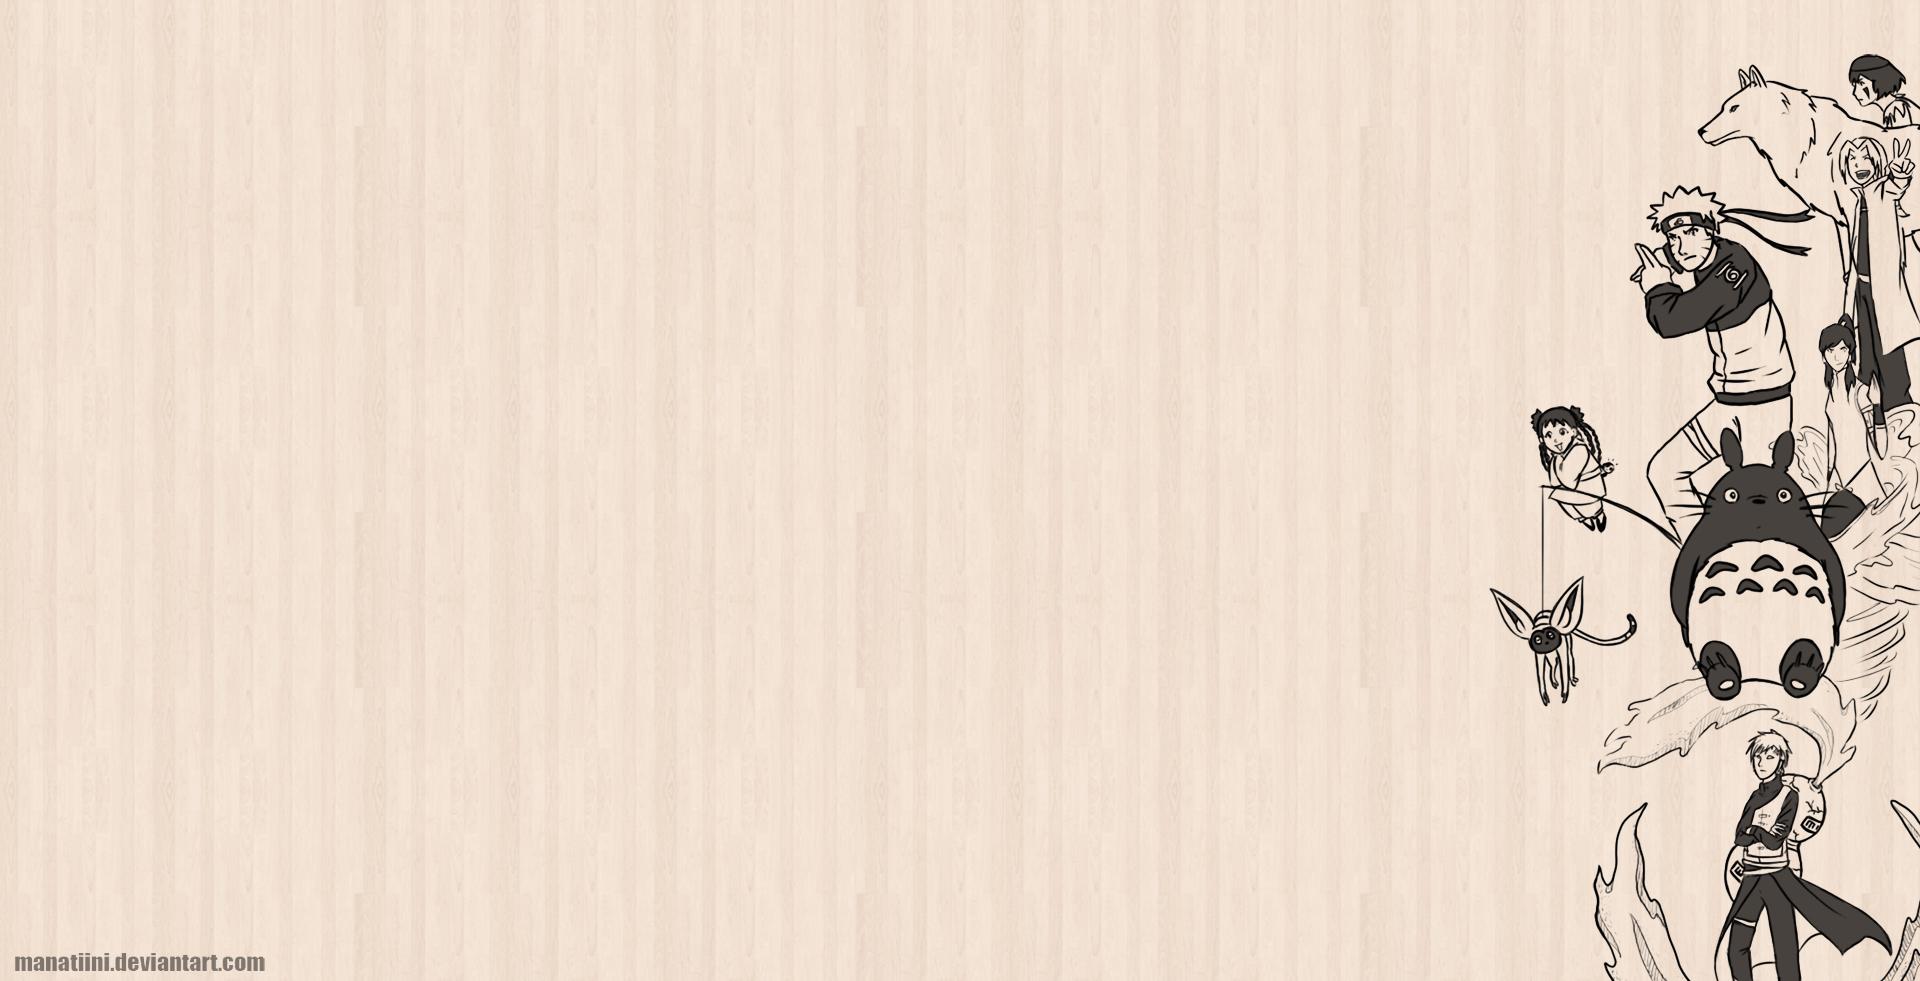 tumblr anime background by manatiini manga anime digital media 1920x981